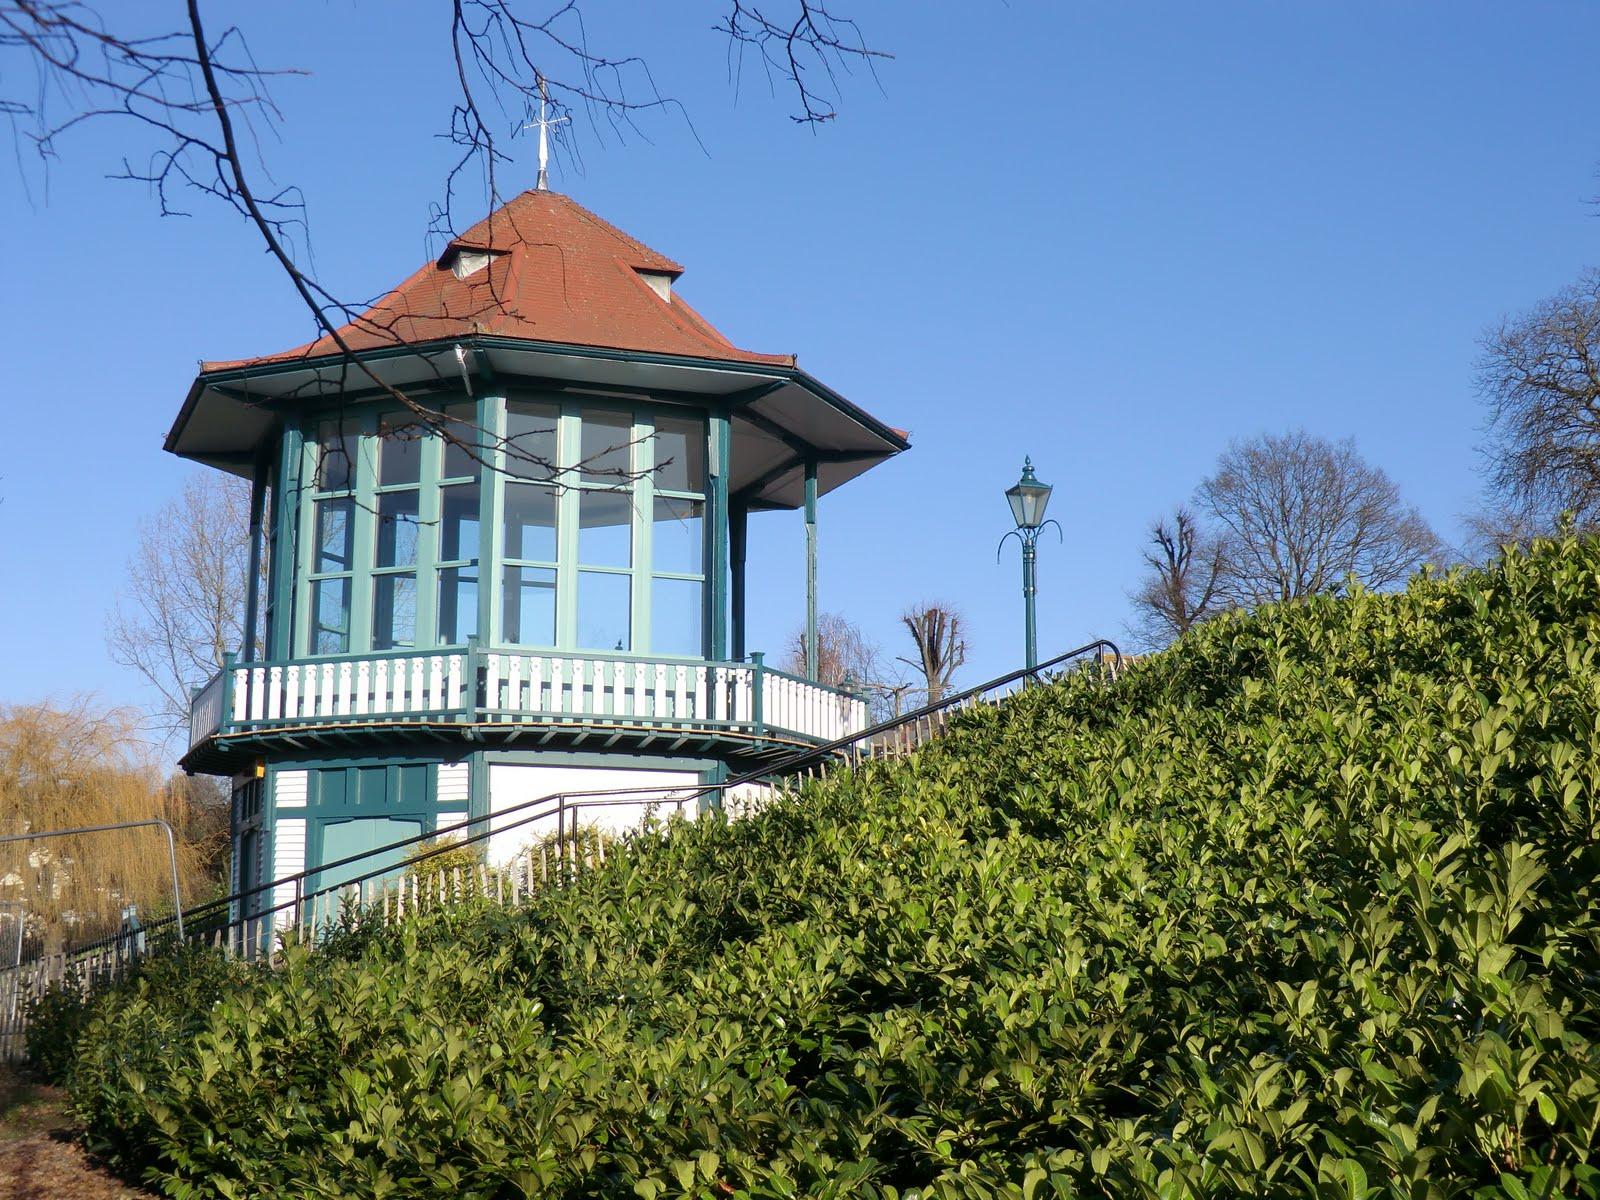 CIMG1617 Bandstand, Horniman Gardens